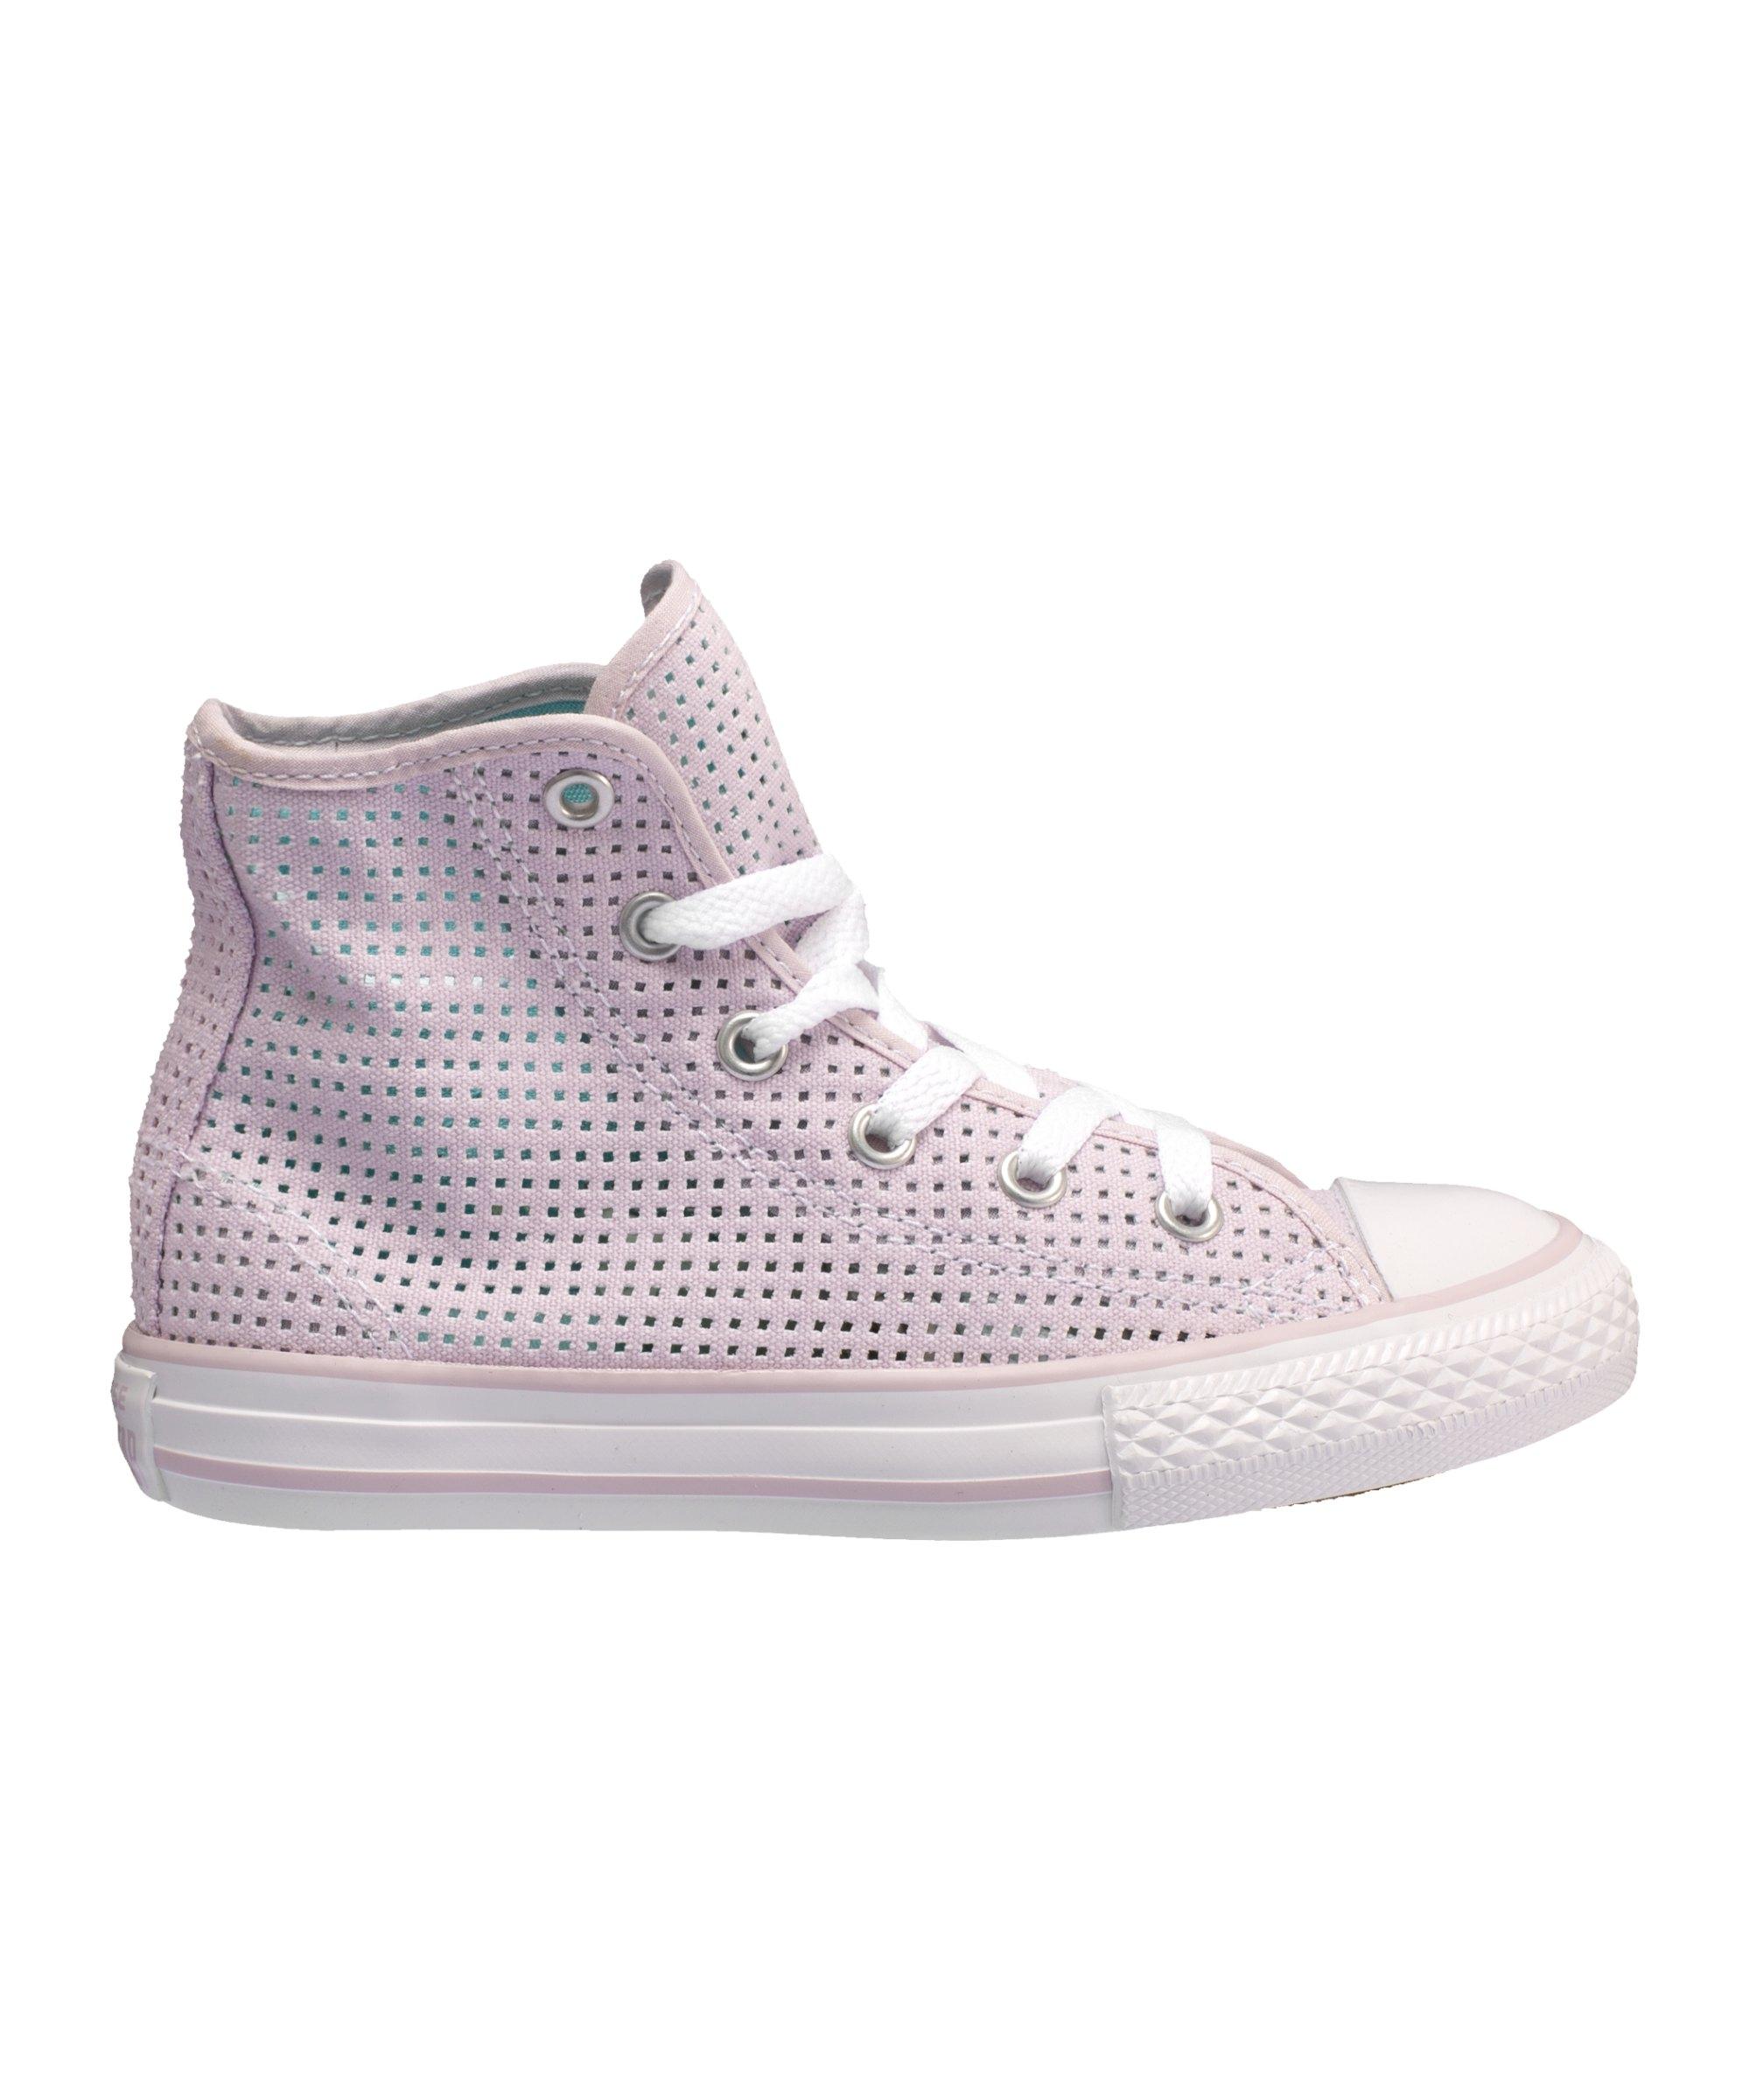 Converse Chuck Taylor AS HI Sneaker Kids Pink - Pink